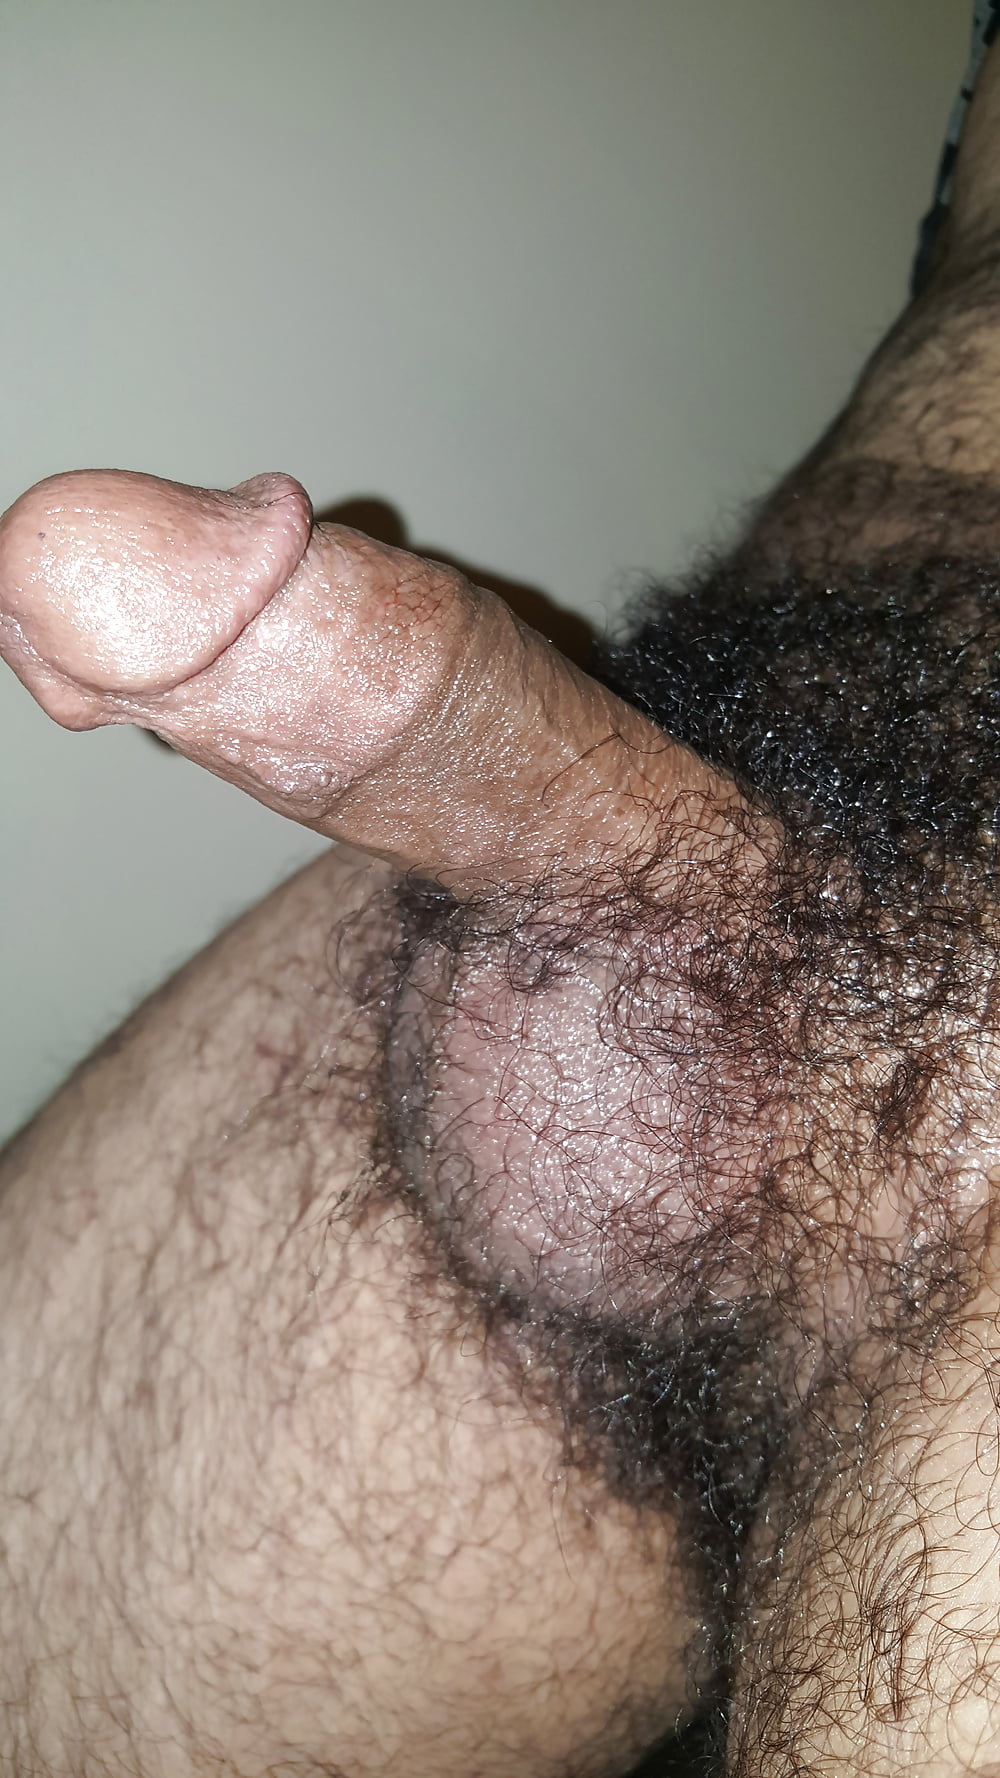 Big hairy dick pics